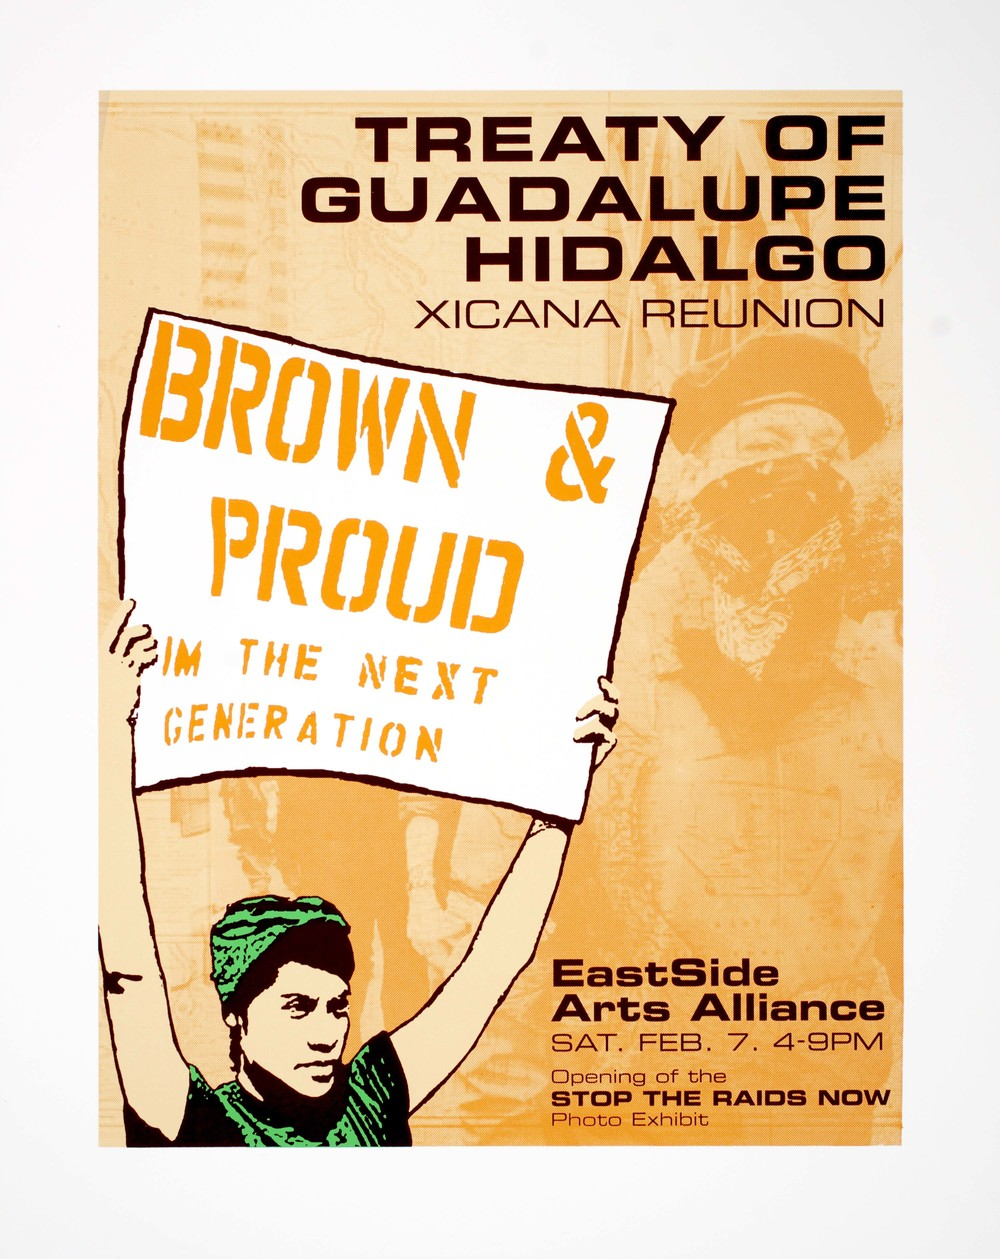 Melanie Cervantes et Barraza, Jesus - Treaty of Guadalupe Hidalgo Xicana Reunion